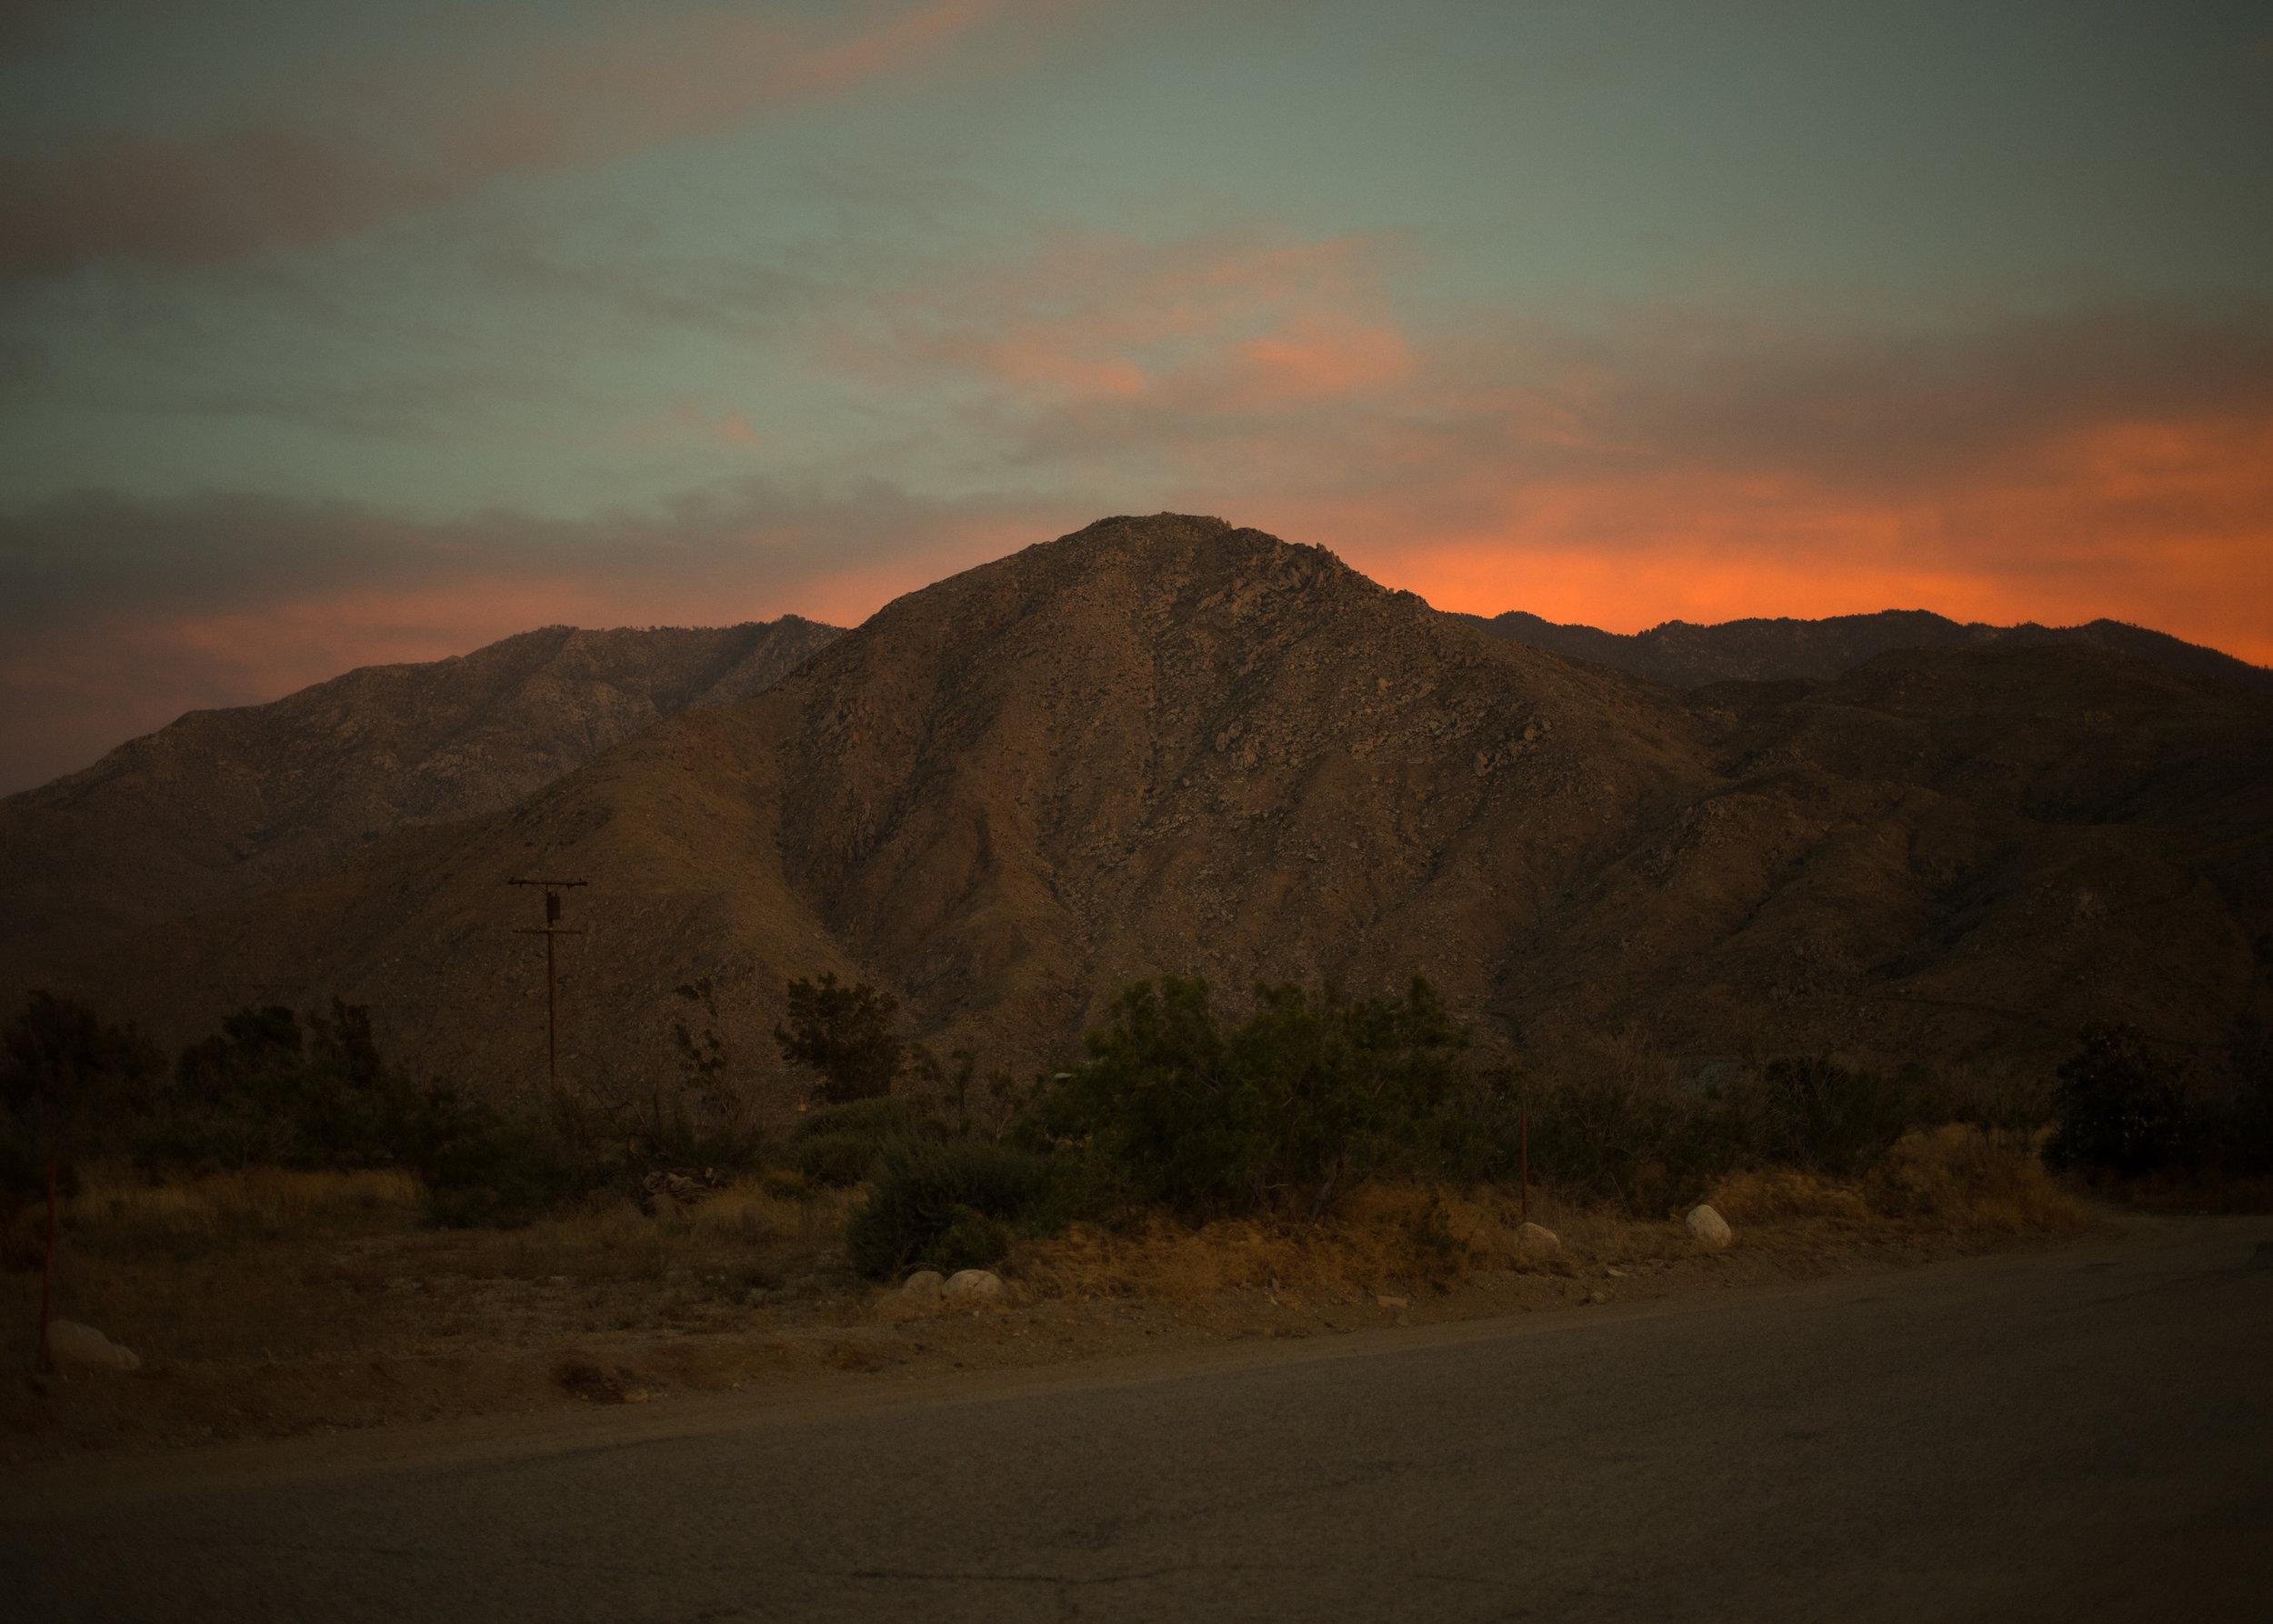 19_Cabazon, Sunset.jpg